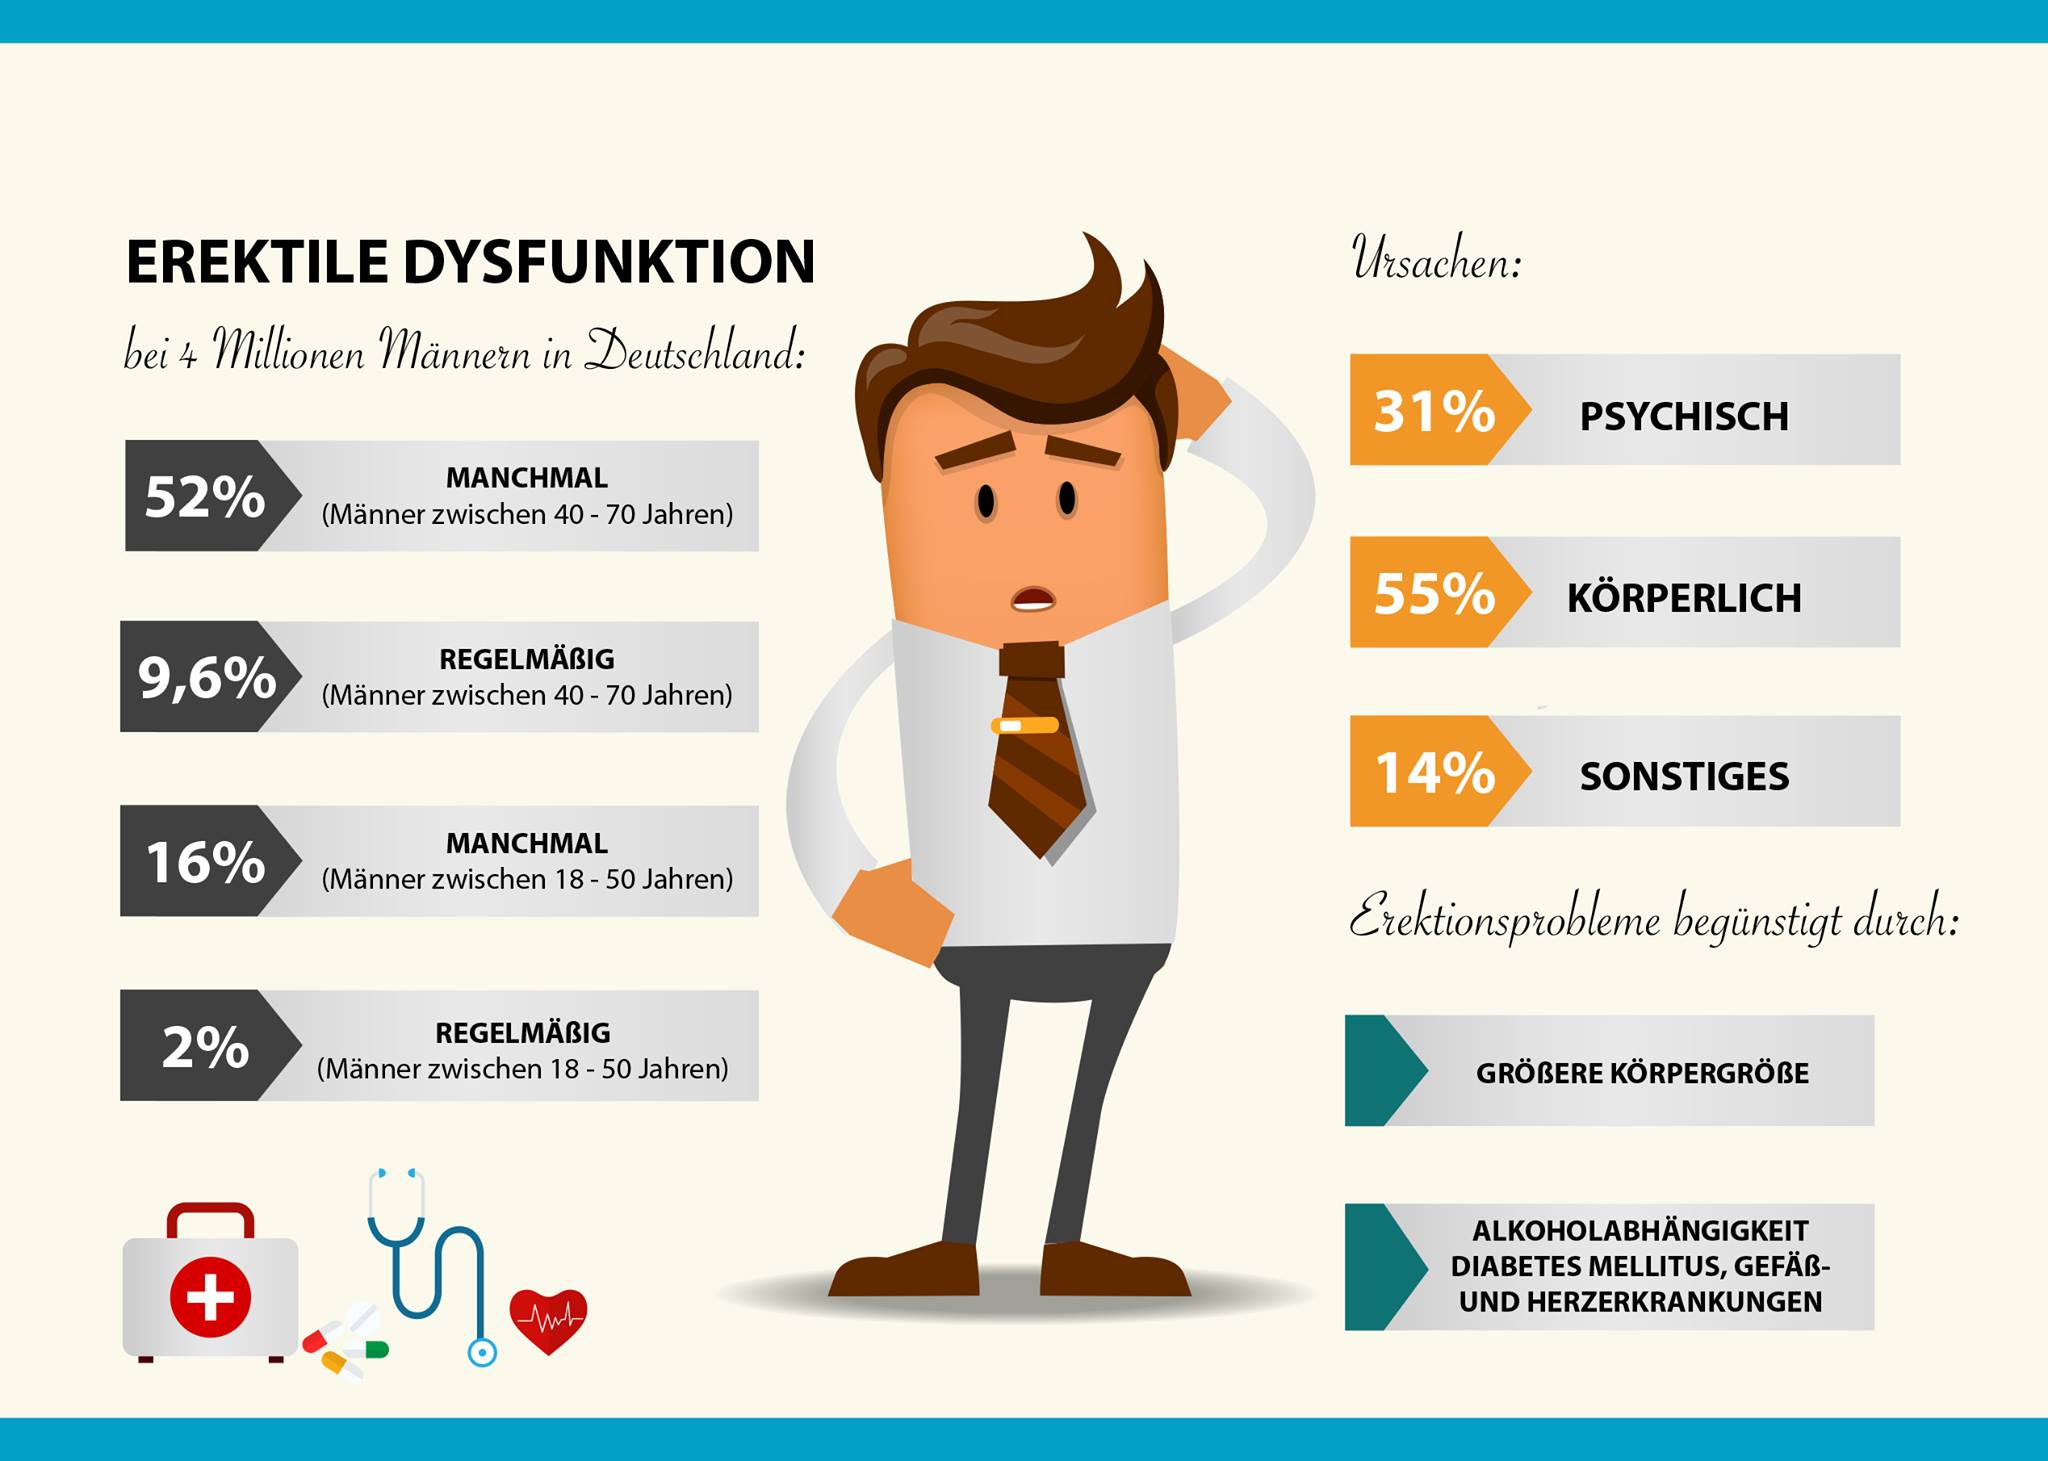 Erektile Dysfunktion Ursachen